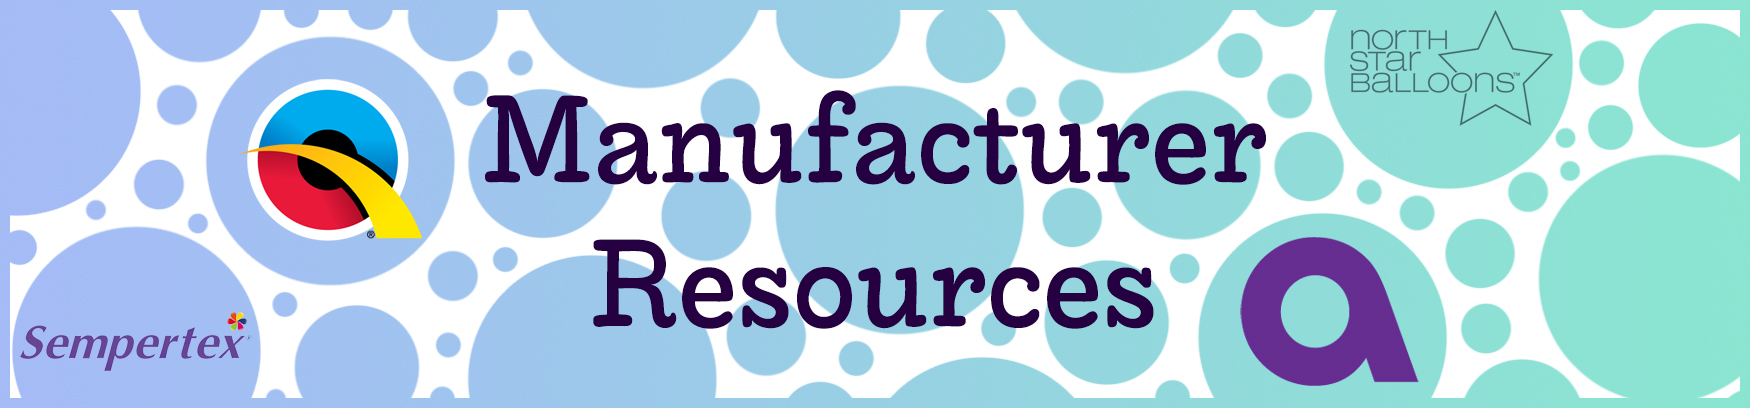 Manufacturer Resources image